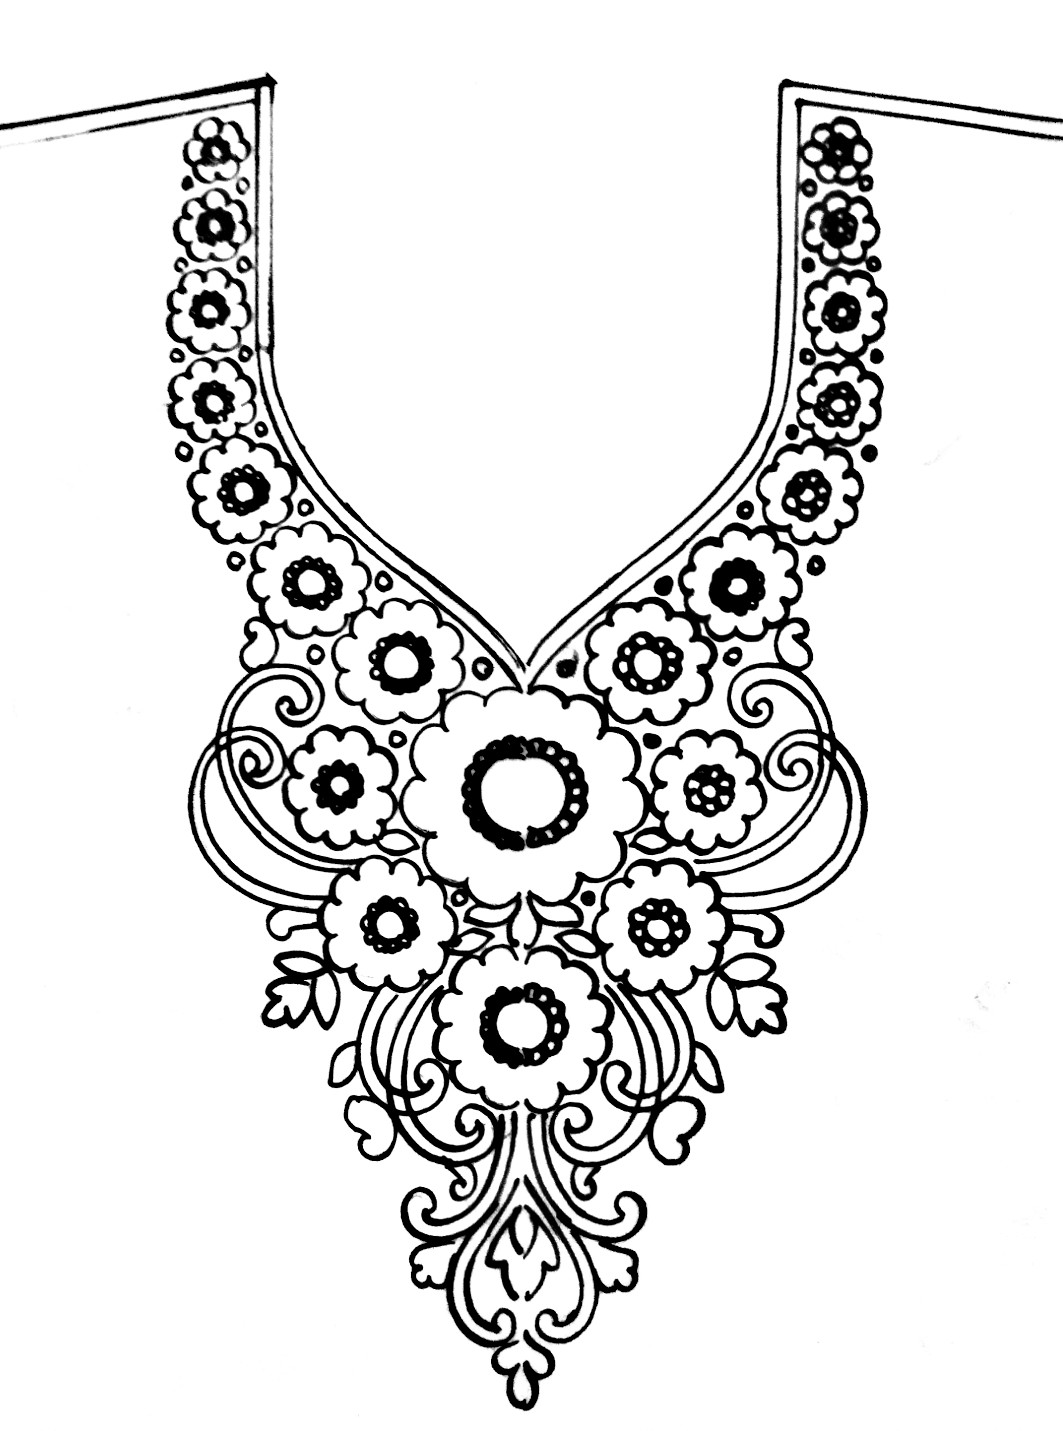 kurti neck designs latest 2019/2020 image || latest kurti neck desig || free download front neck design for kurti.